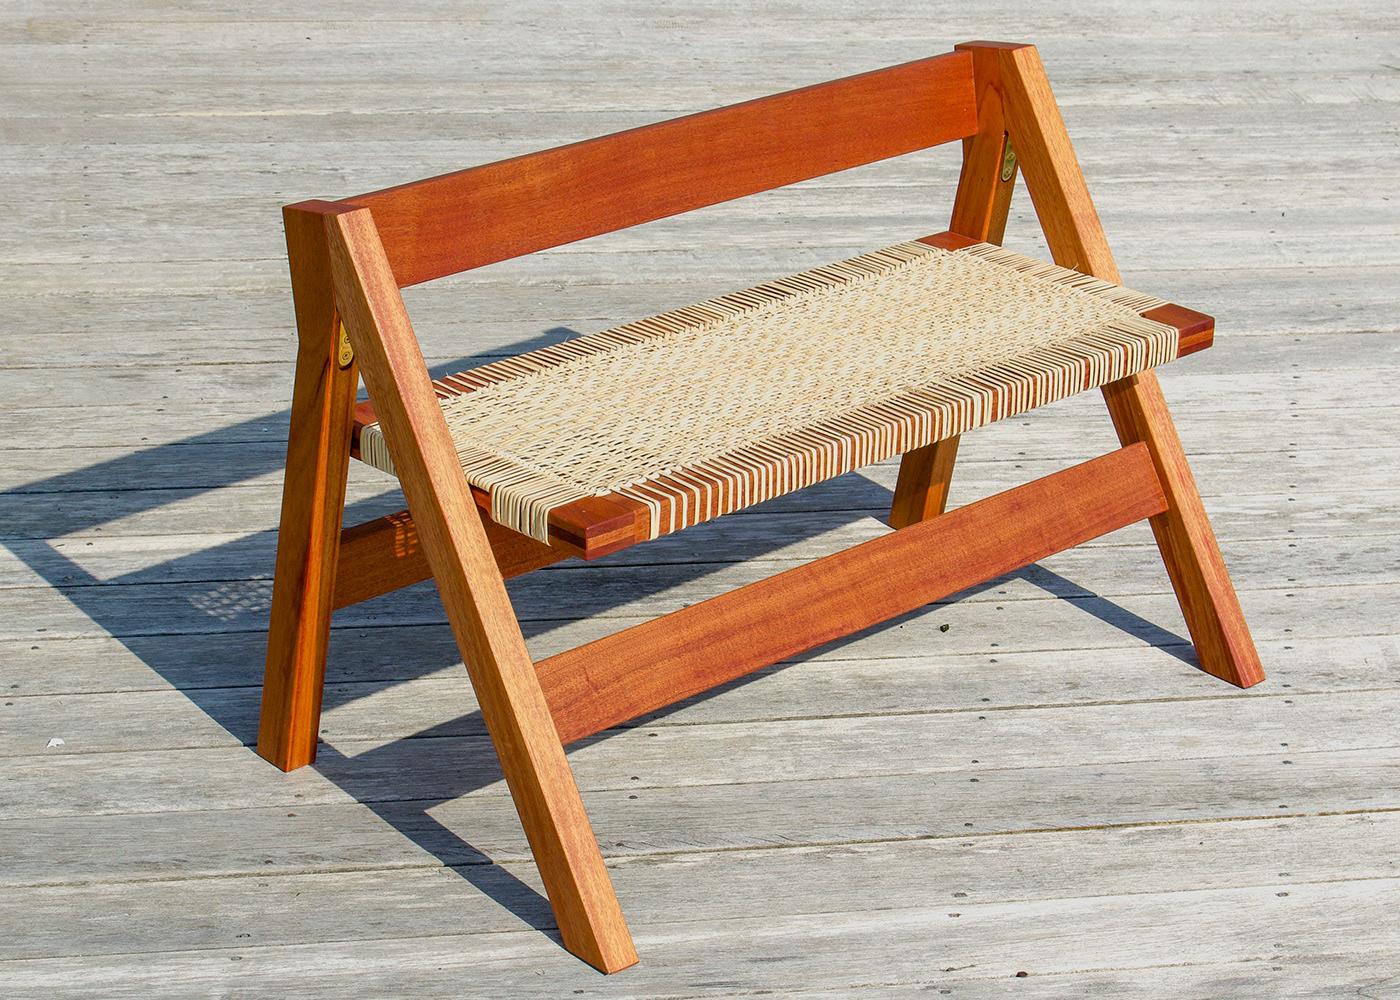 furniture design ,woodworking